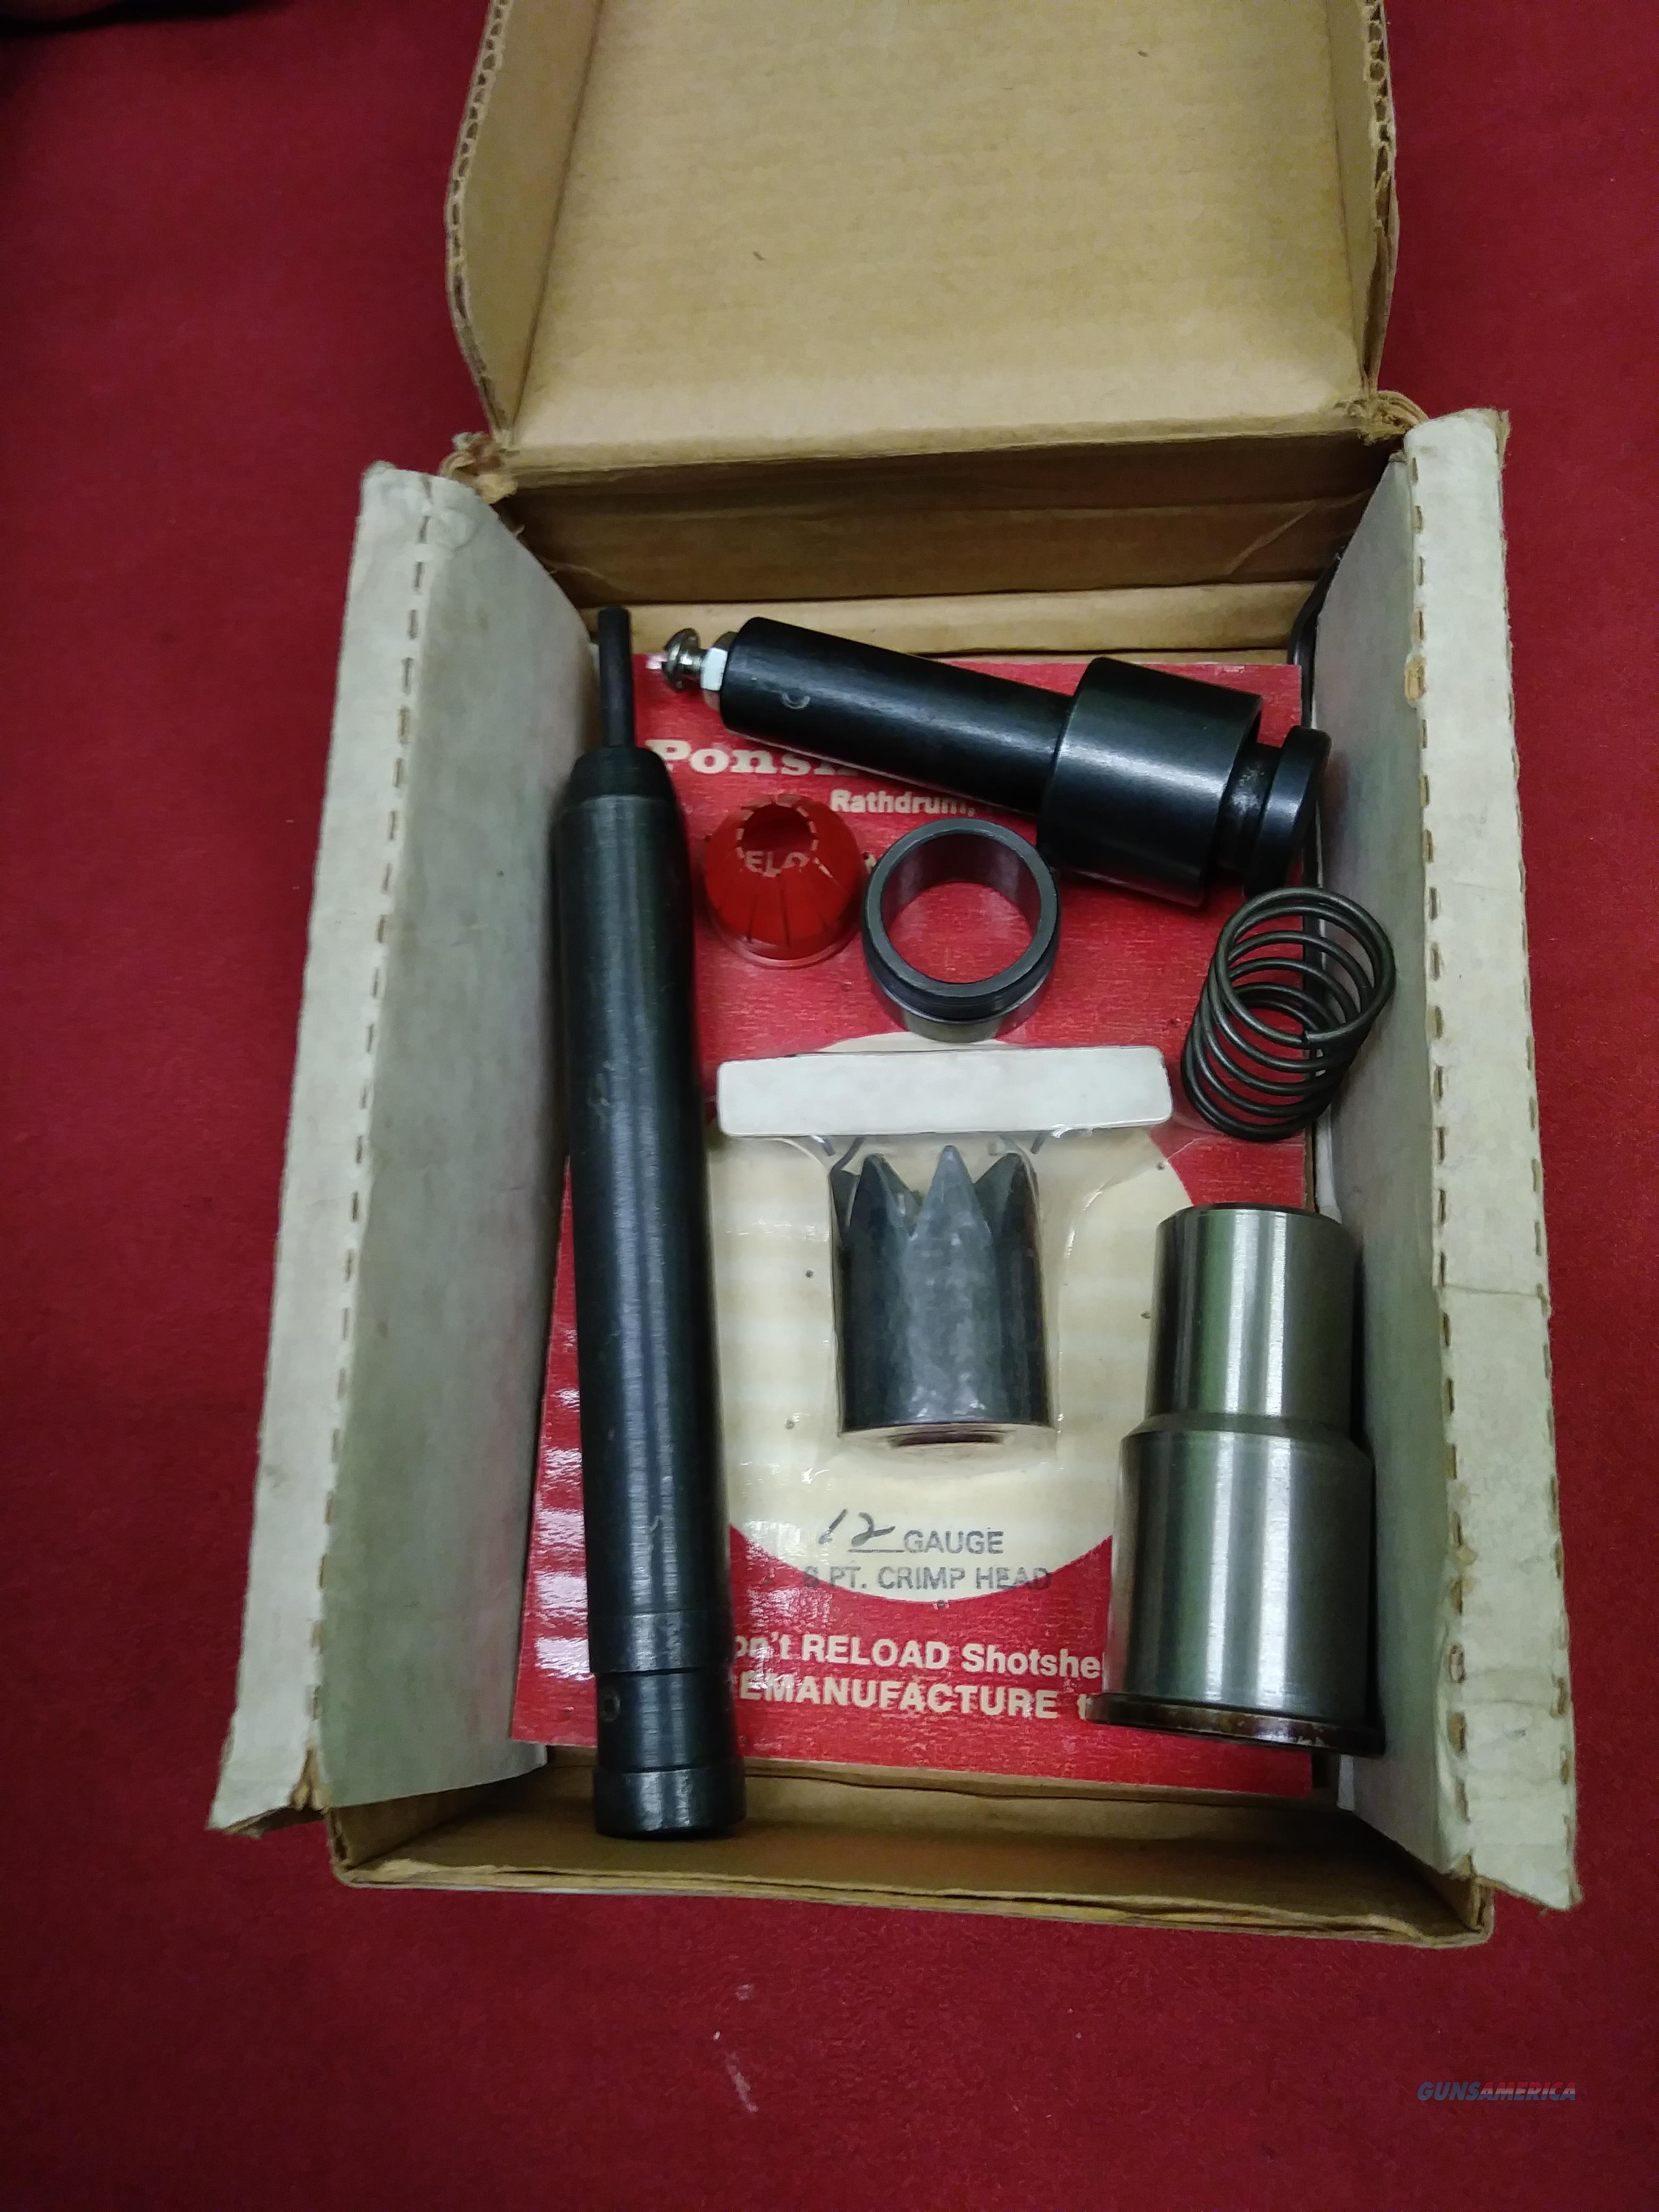 Ponsness-Warren Duomatic 12 Gauge Reloading Accessories  Non-Guns > Reloading > Equipment > Metallic > Misc